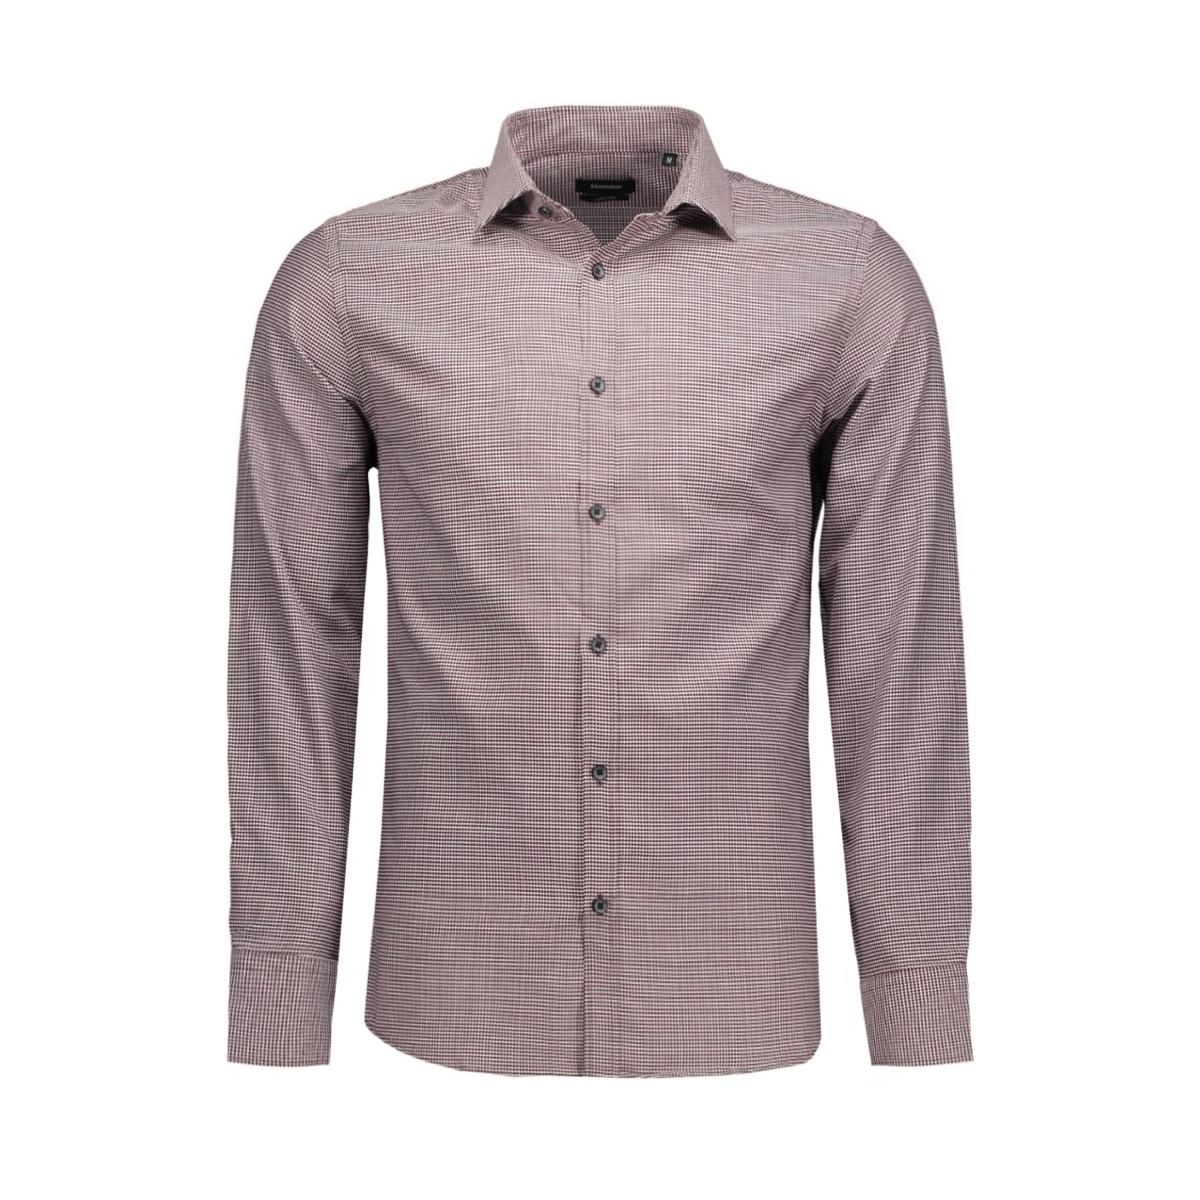 trostol 30201209 matinique overhemd 20640 burgundy